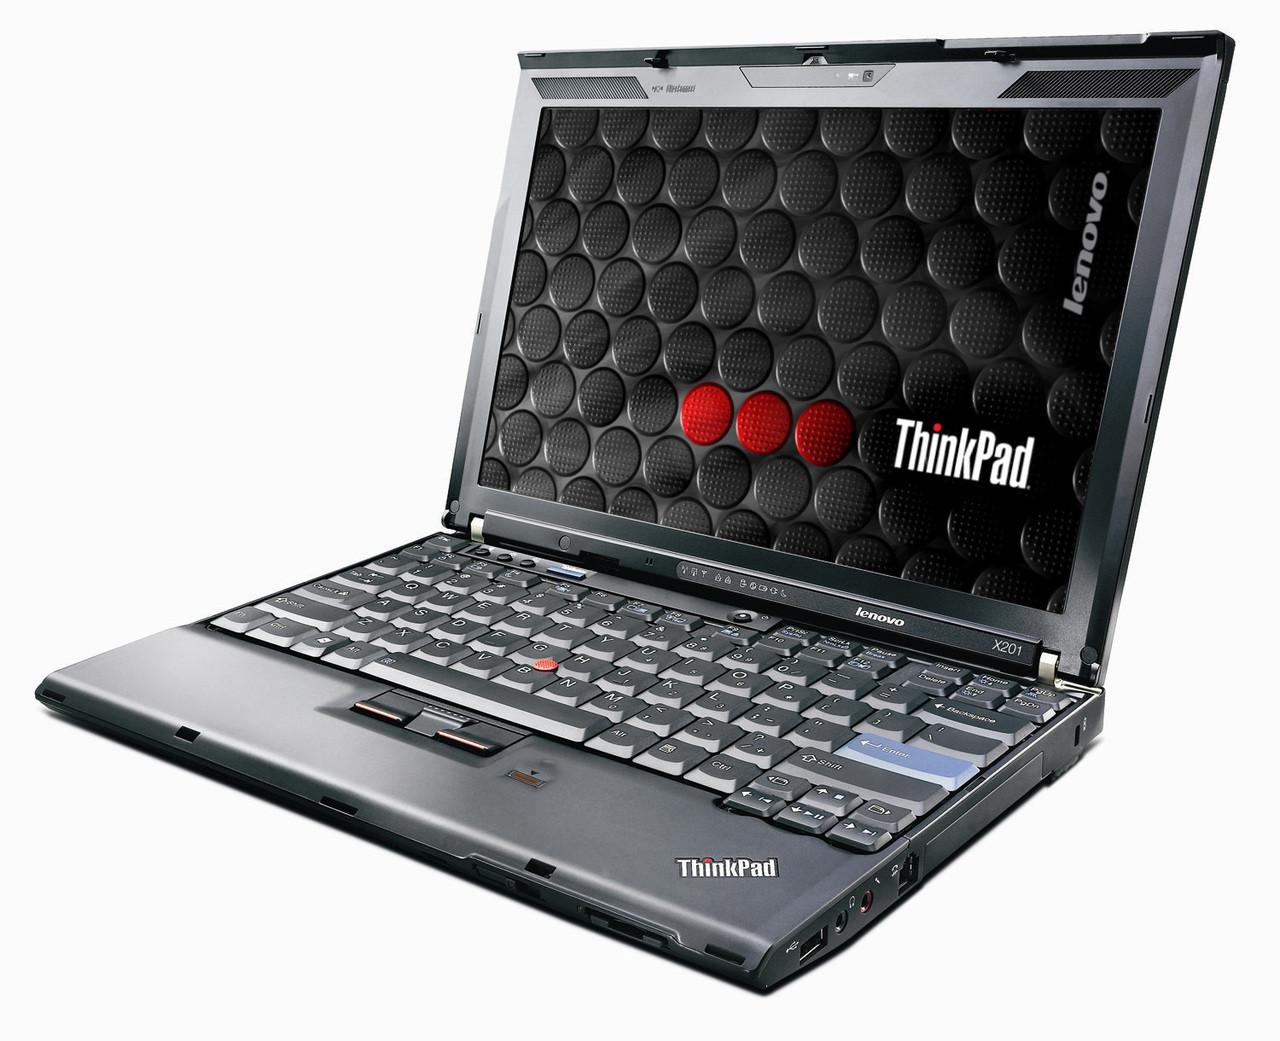 Lenovo Thinkpad X201 - right side view